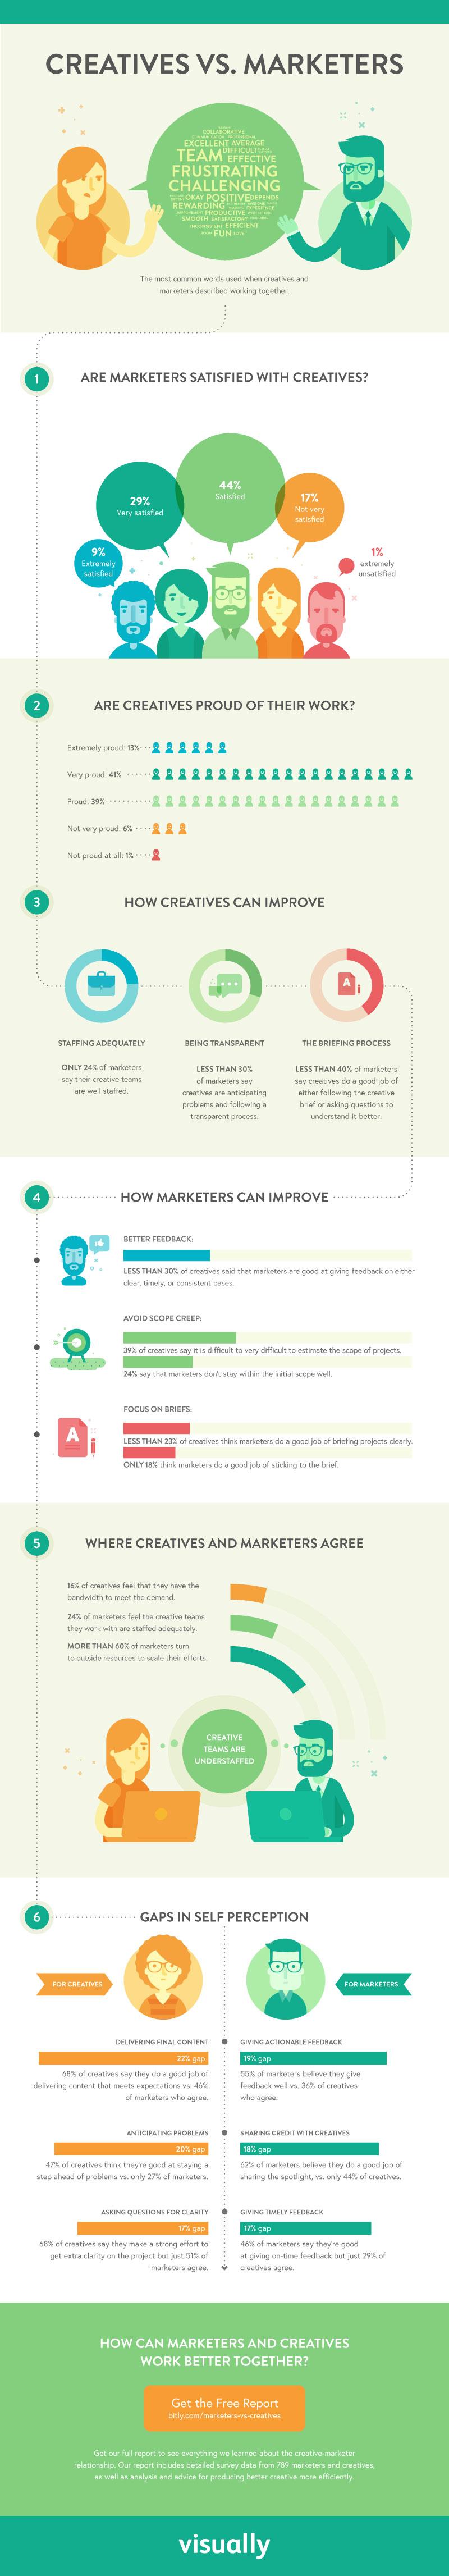 creatives-and-marketers-misunderstanding-infographic